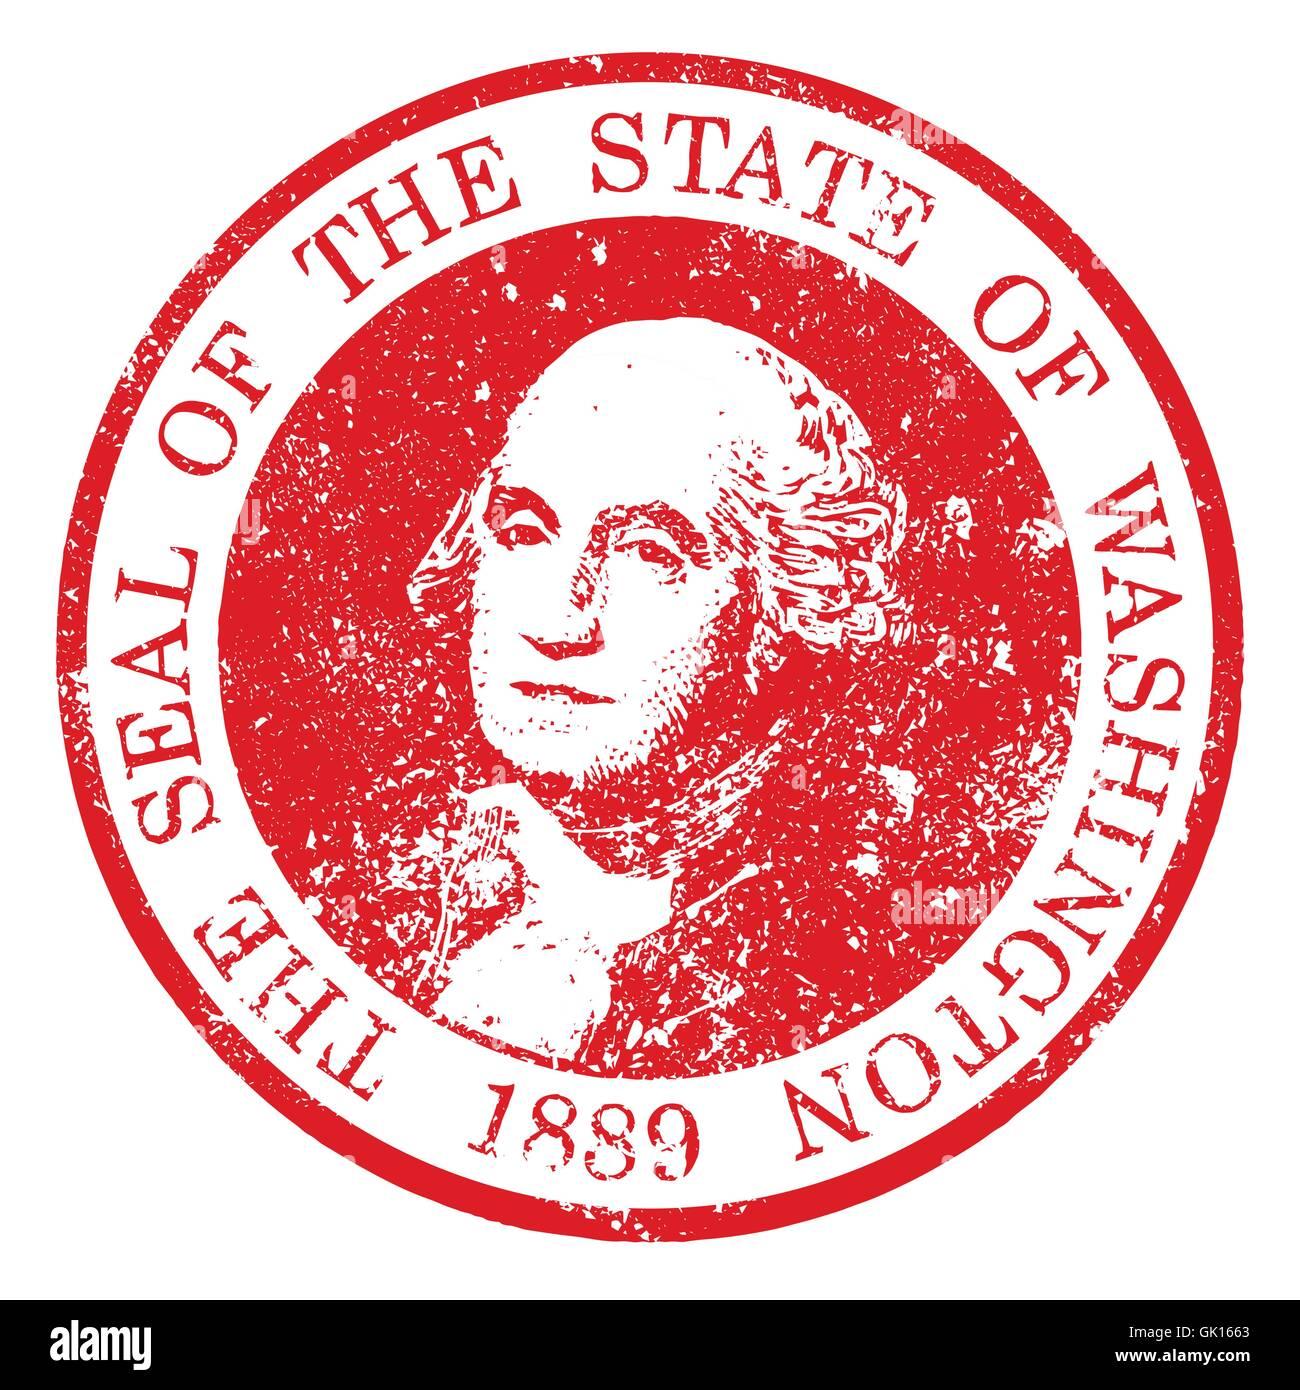 Washington State Seal Stamp - Stock Vector